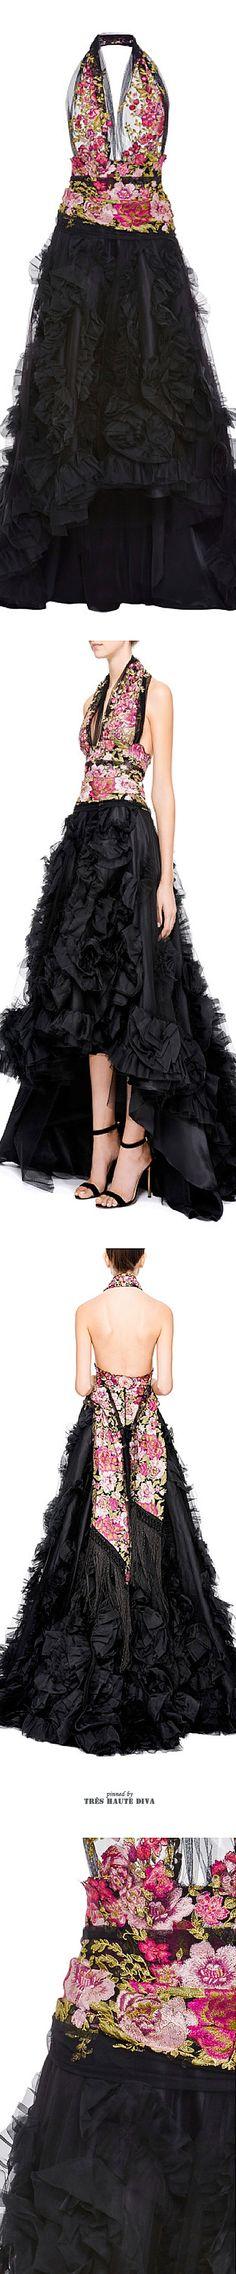 Marchesa Ruffled Organza Halter Gown SS 2015 ♔THD♔